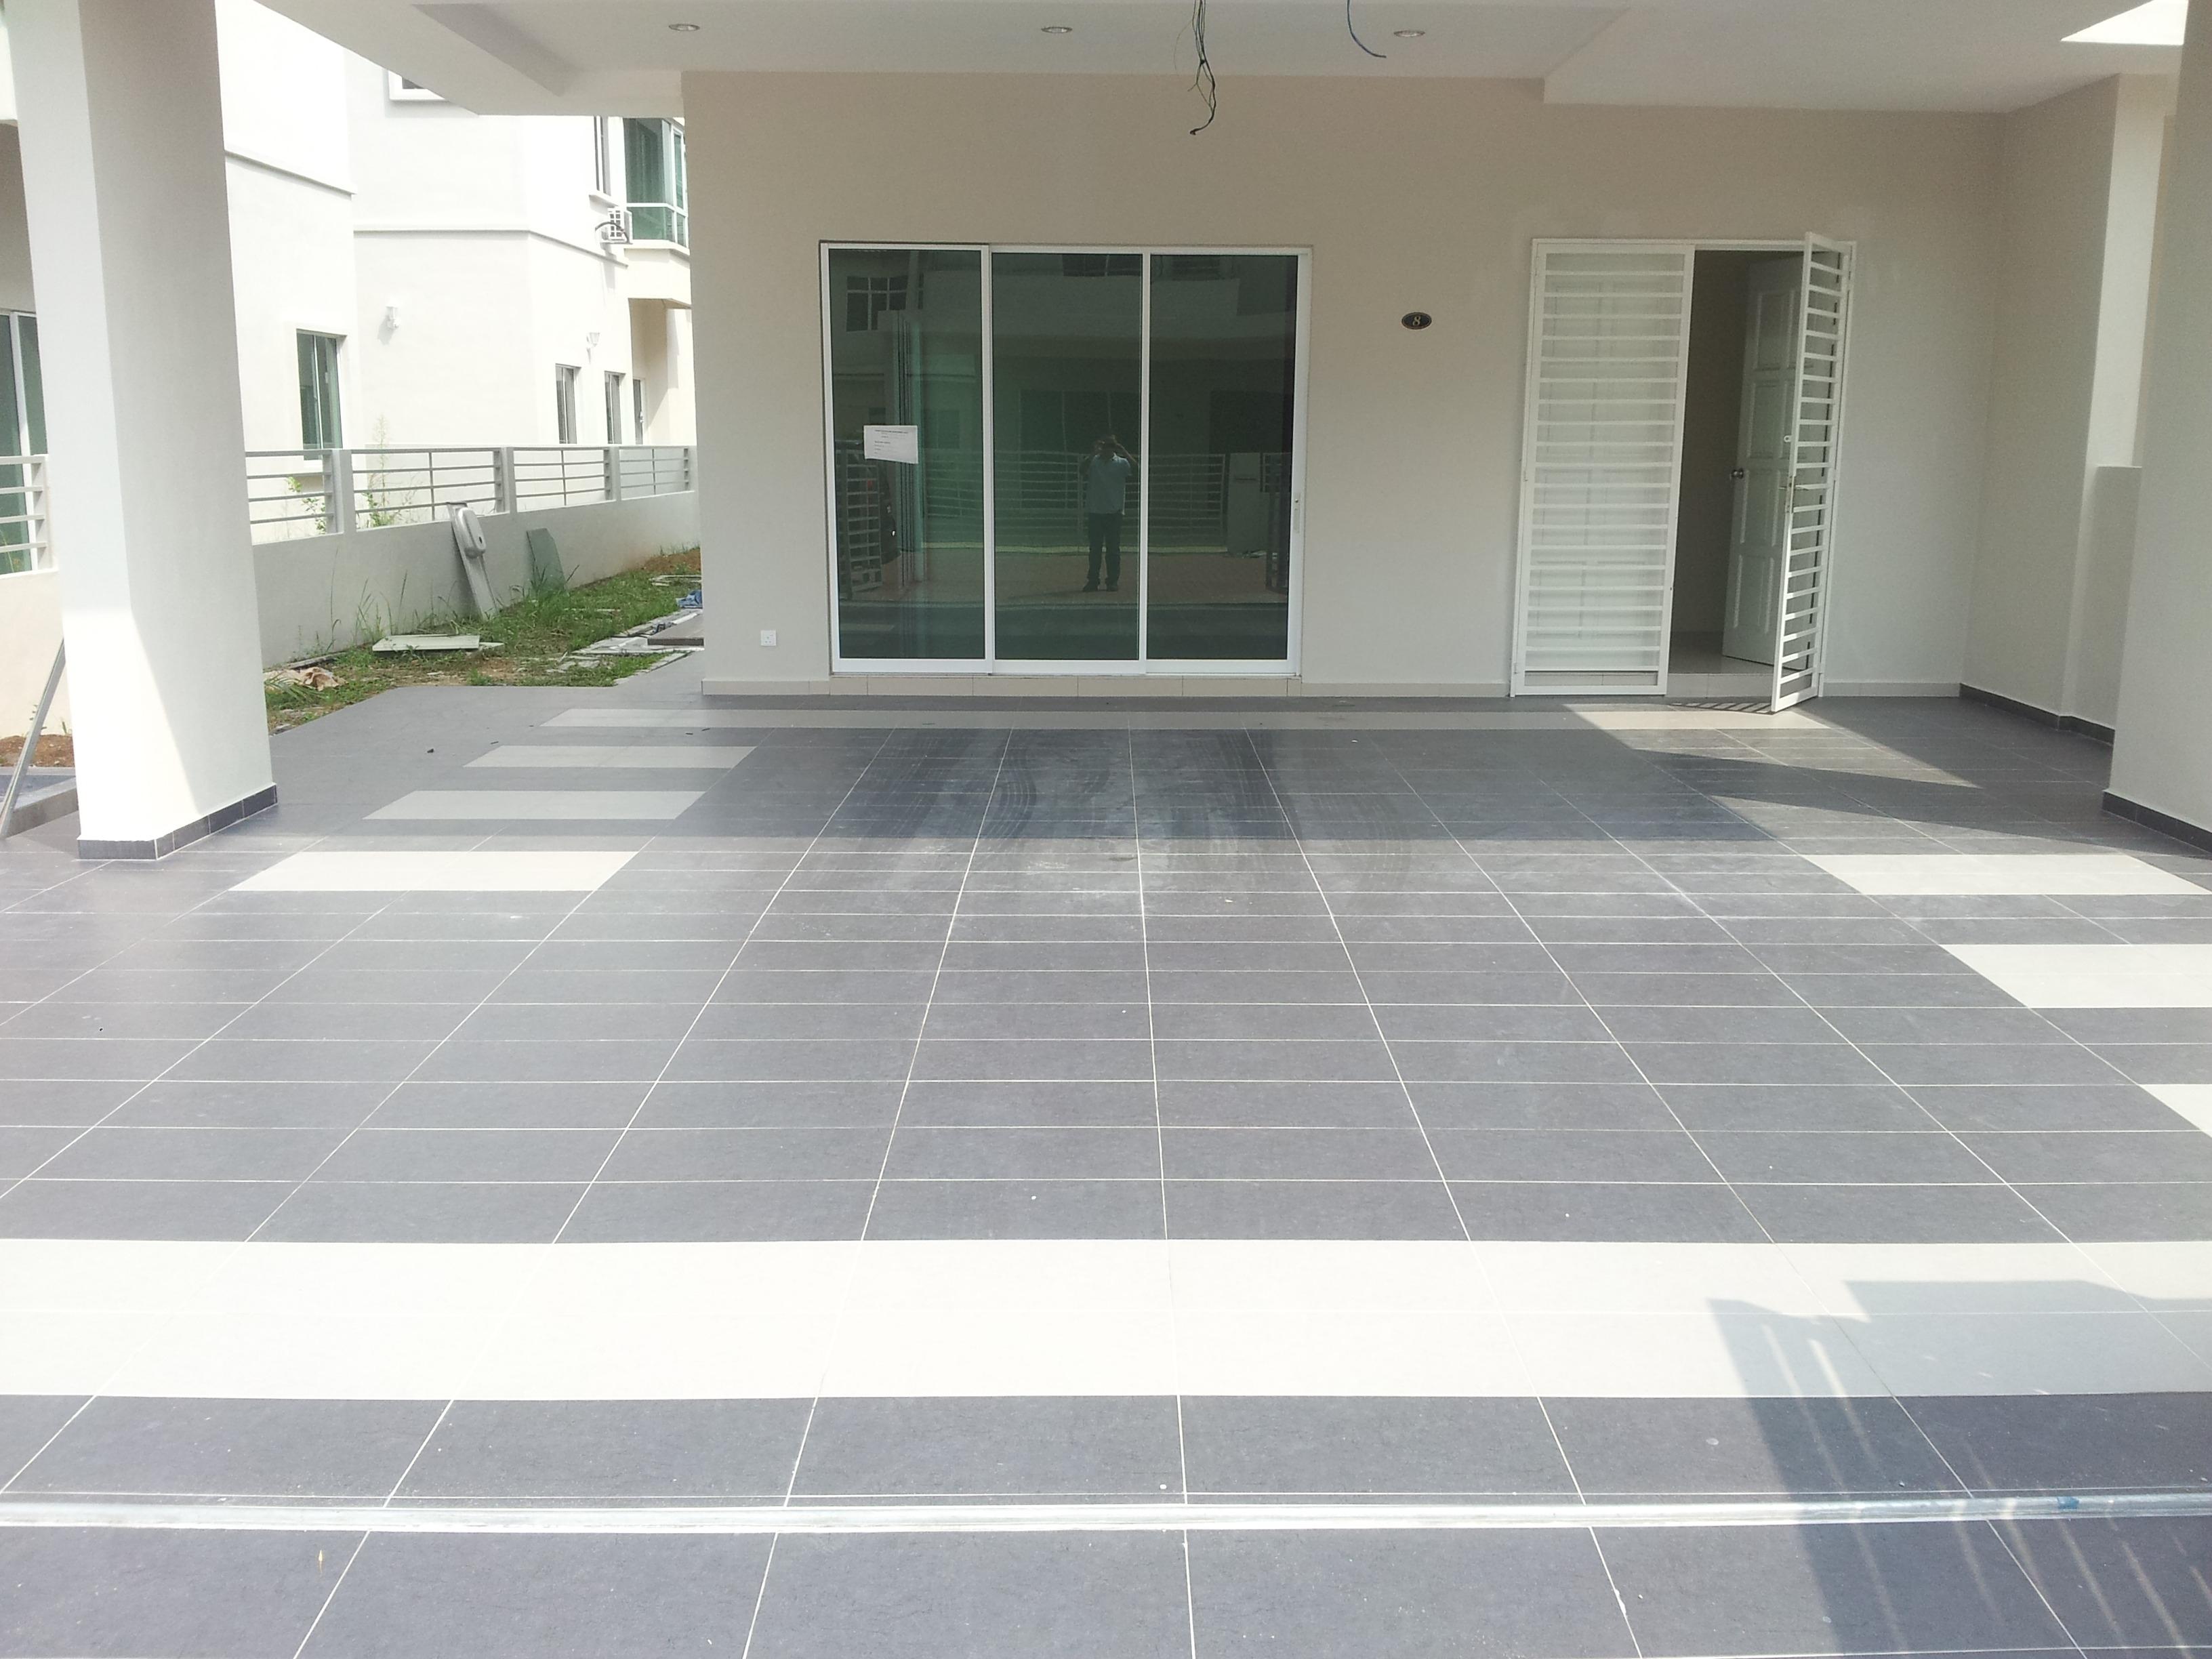 Design Tile Car Porch Tile Designs Within Car Porch Marble Design intended for measurements 3264 X 2448